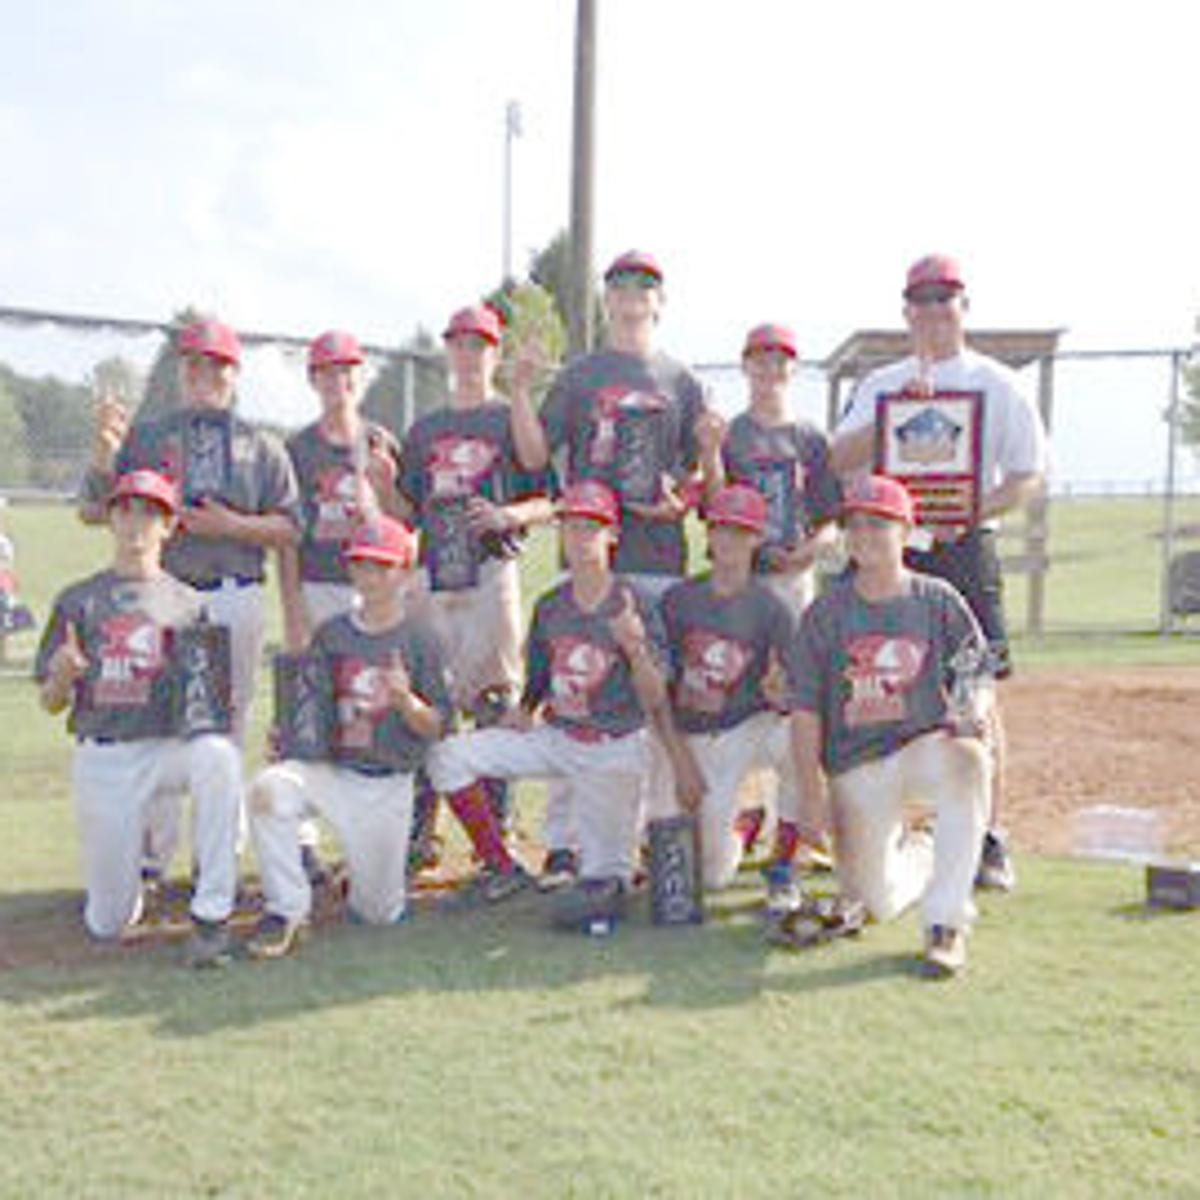 Youth Baseball And Softball Champs Sc 13u Lake Marion All Stars Sc 16 Under Hurricanes Sports Thetandd Com